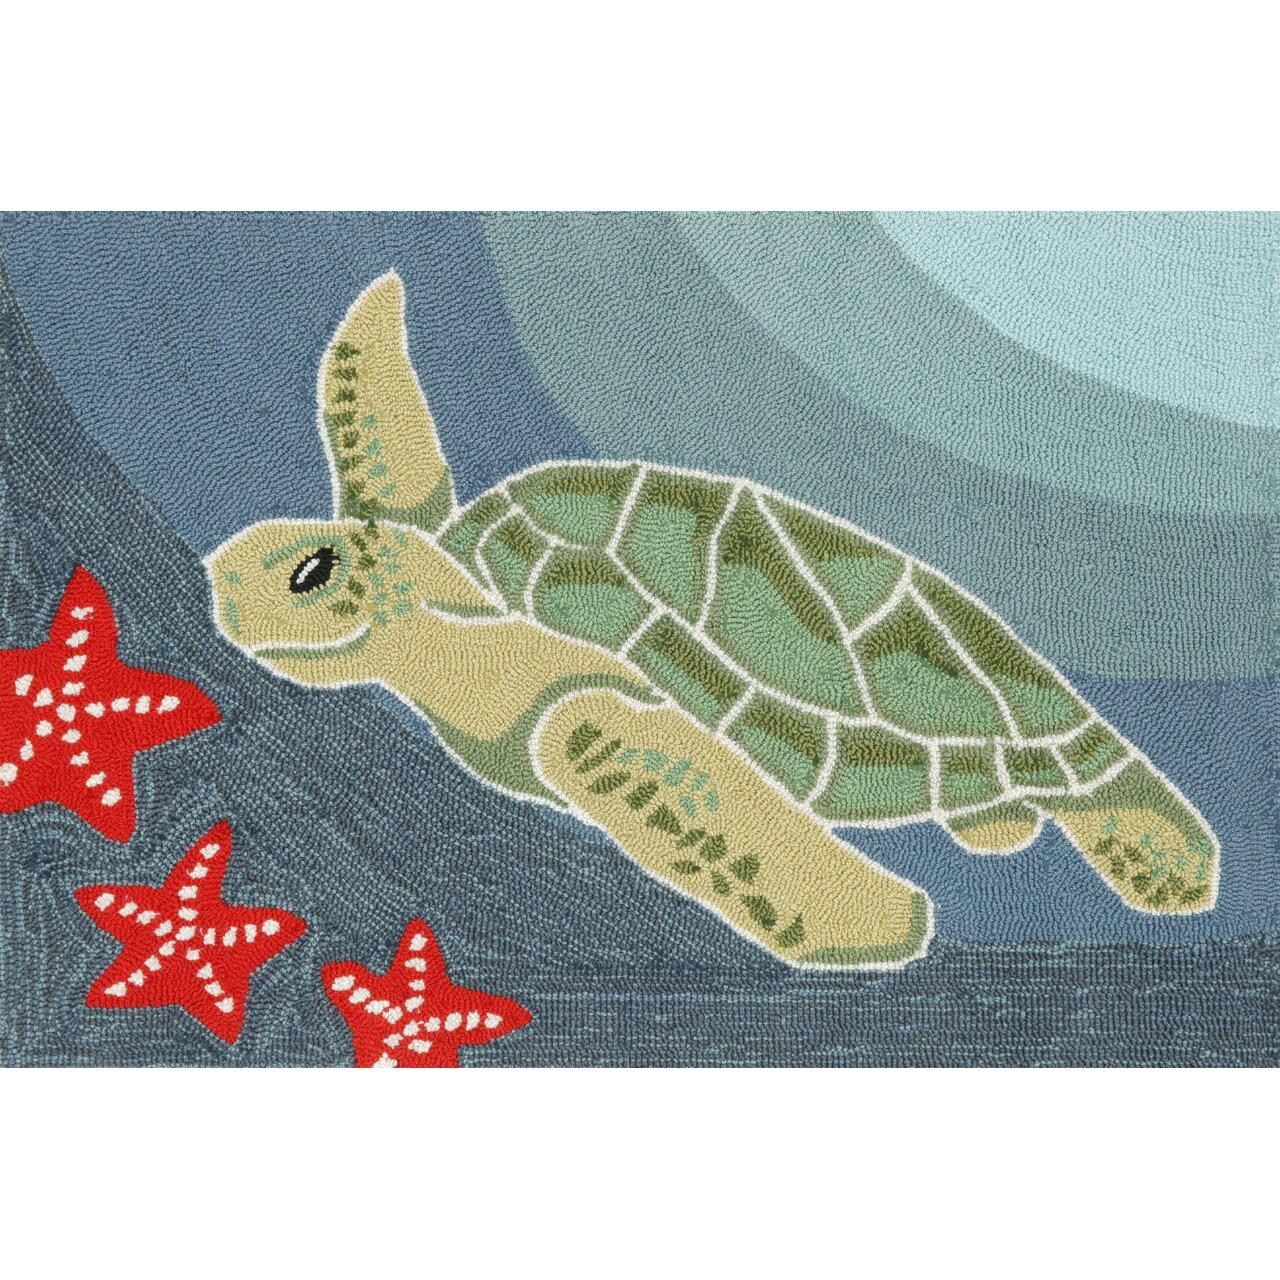 Liora Manne Frontporch Blue Ocean Sea Turtle Area Rug